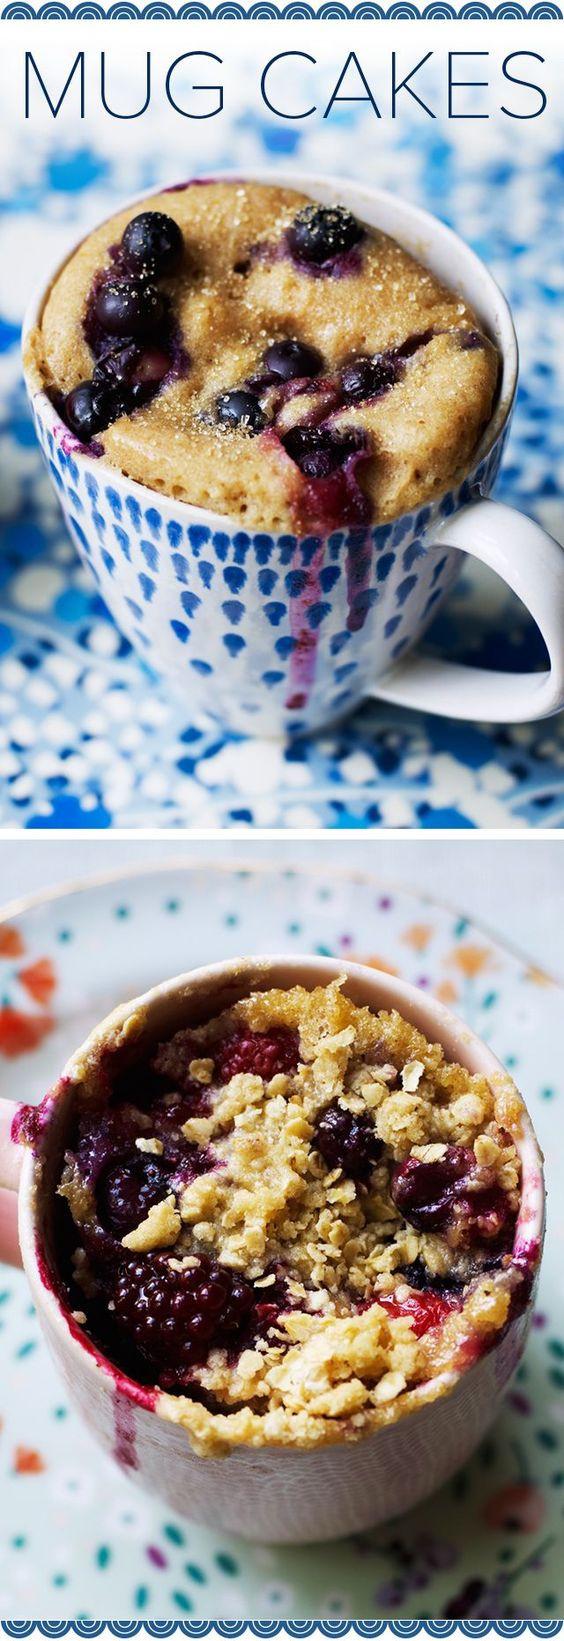 Breakfast Mug Recipes  Mug cakes Recipes for breakfast and Mugs on Pinterest